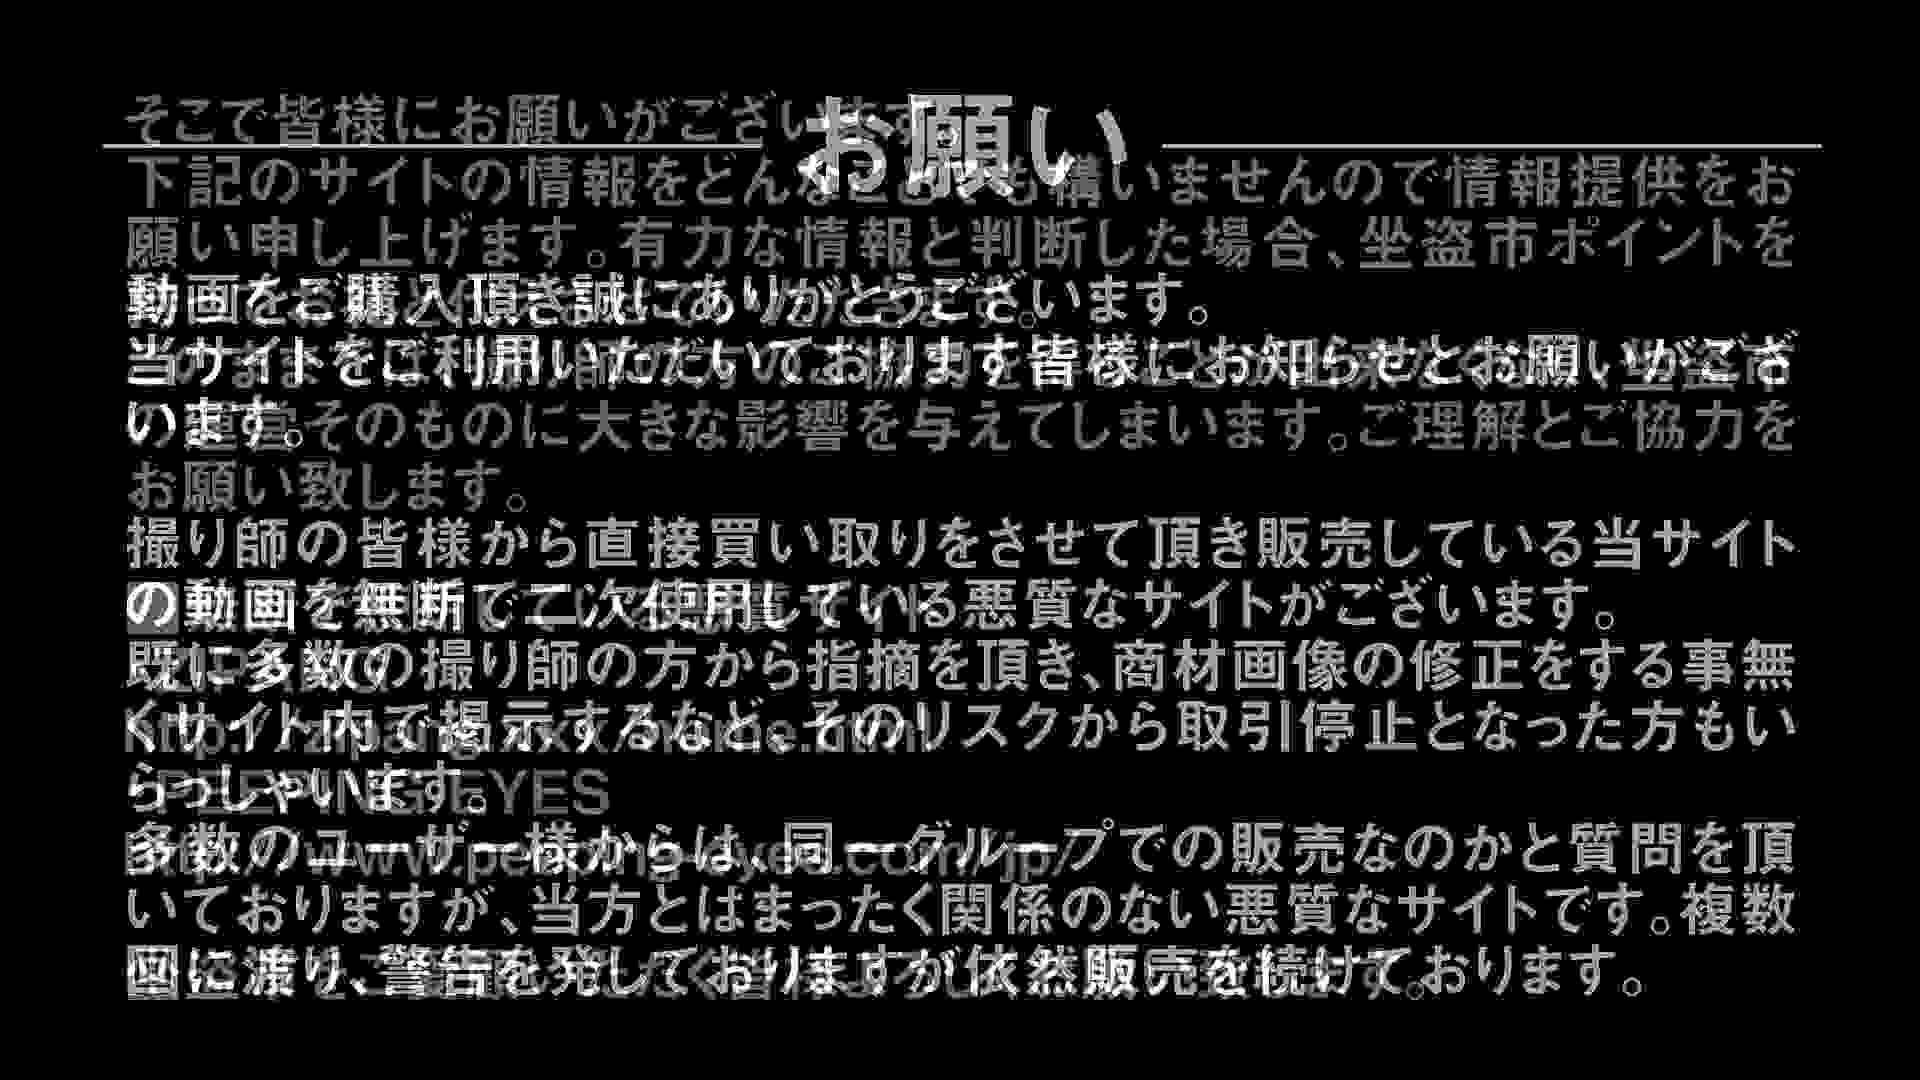 Aquaな露天風呂Vol.300 盗撮シリーズ | 露天風呂編  110PIX 31